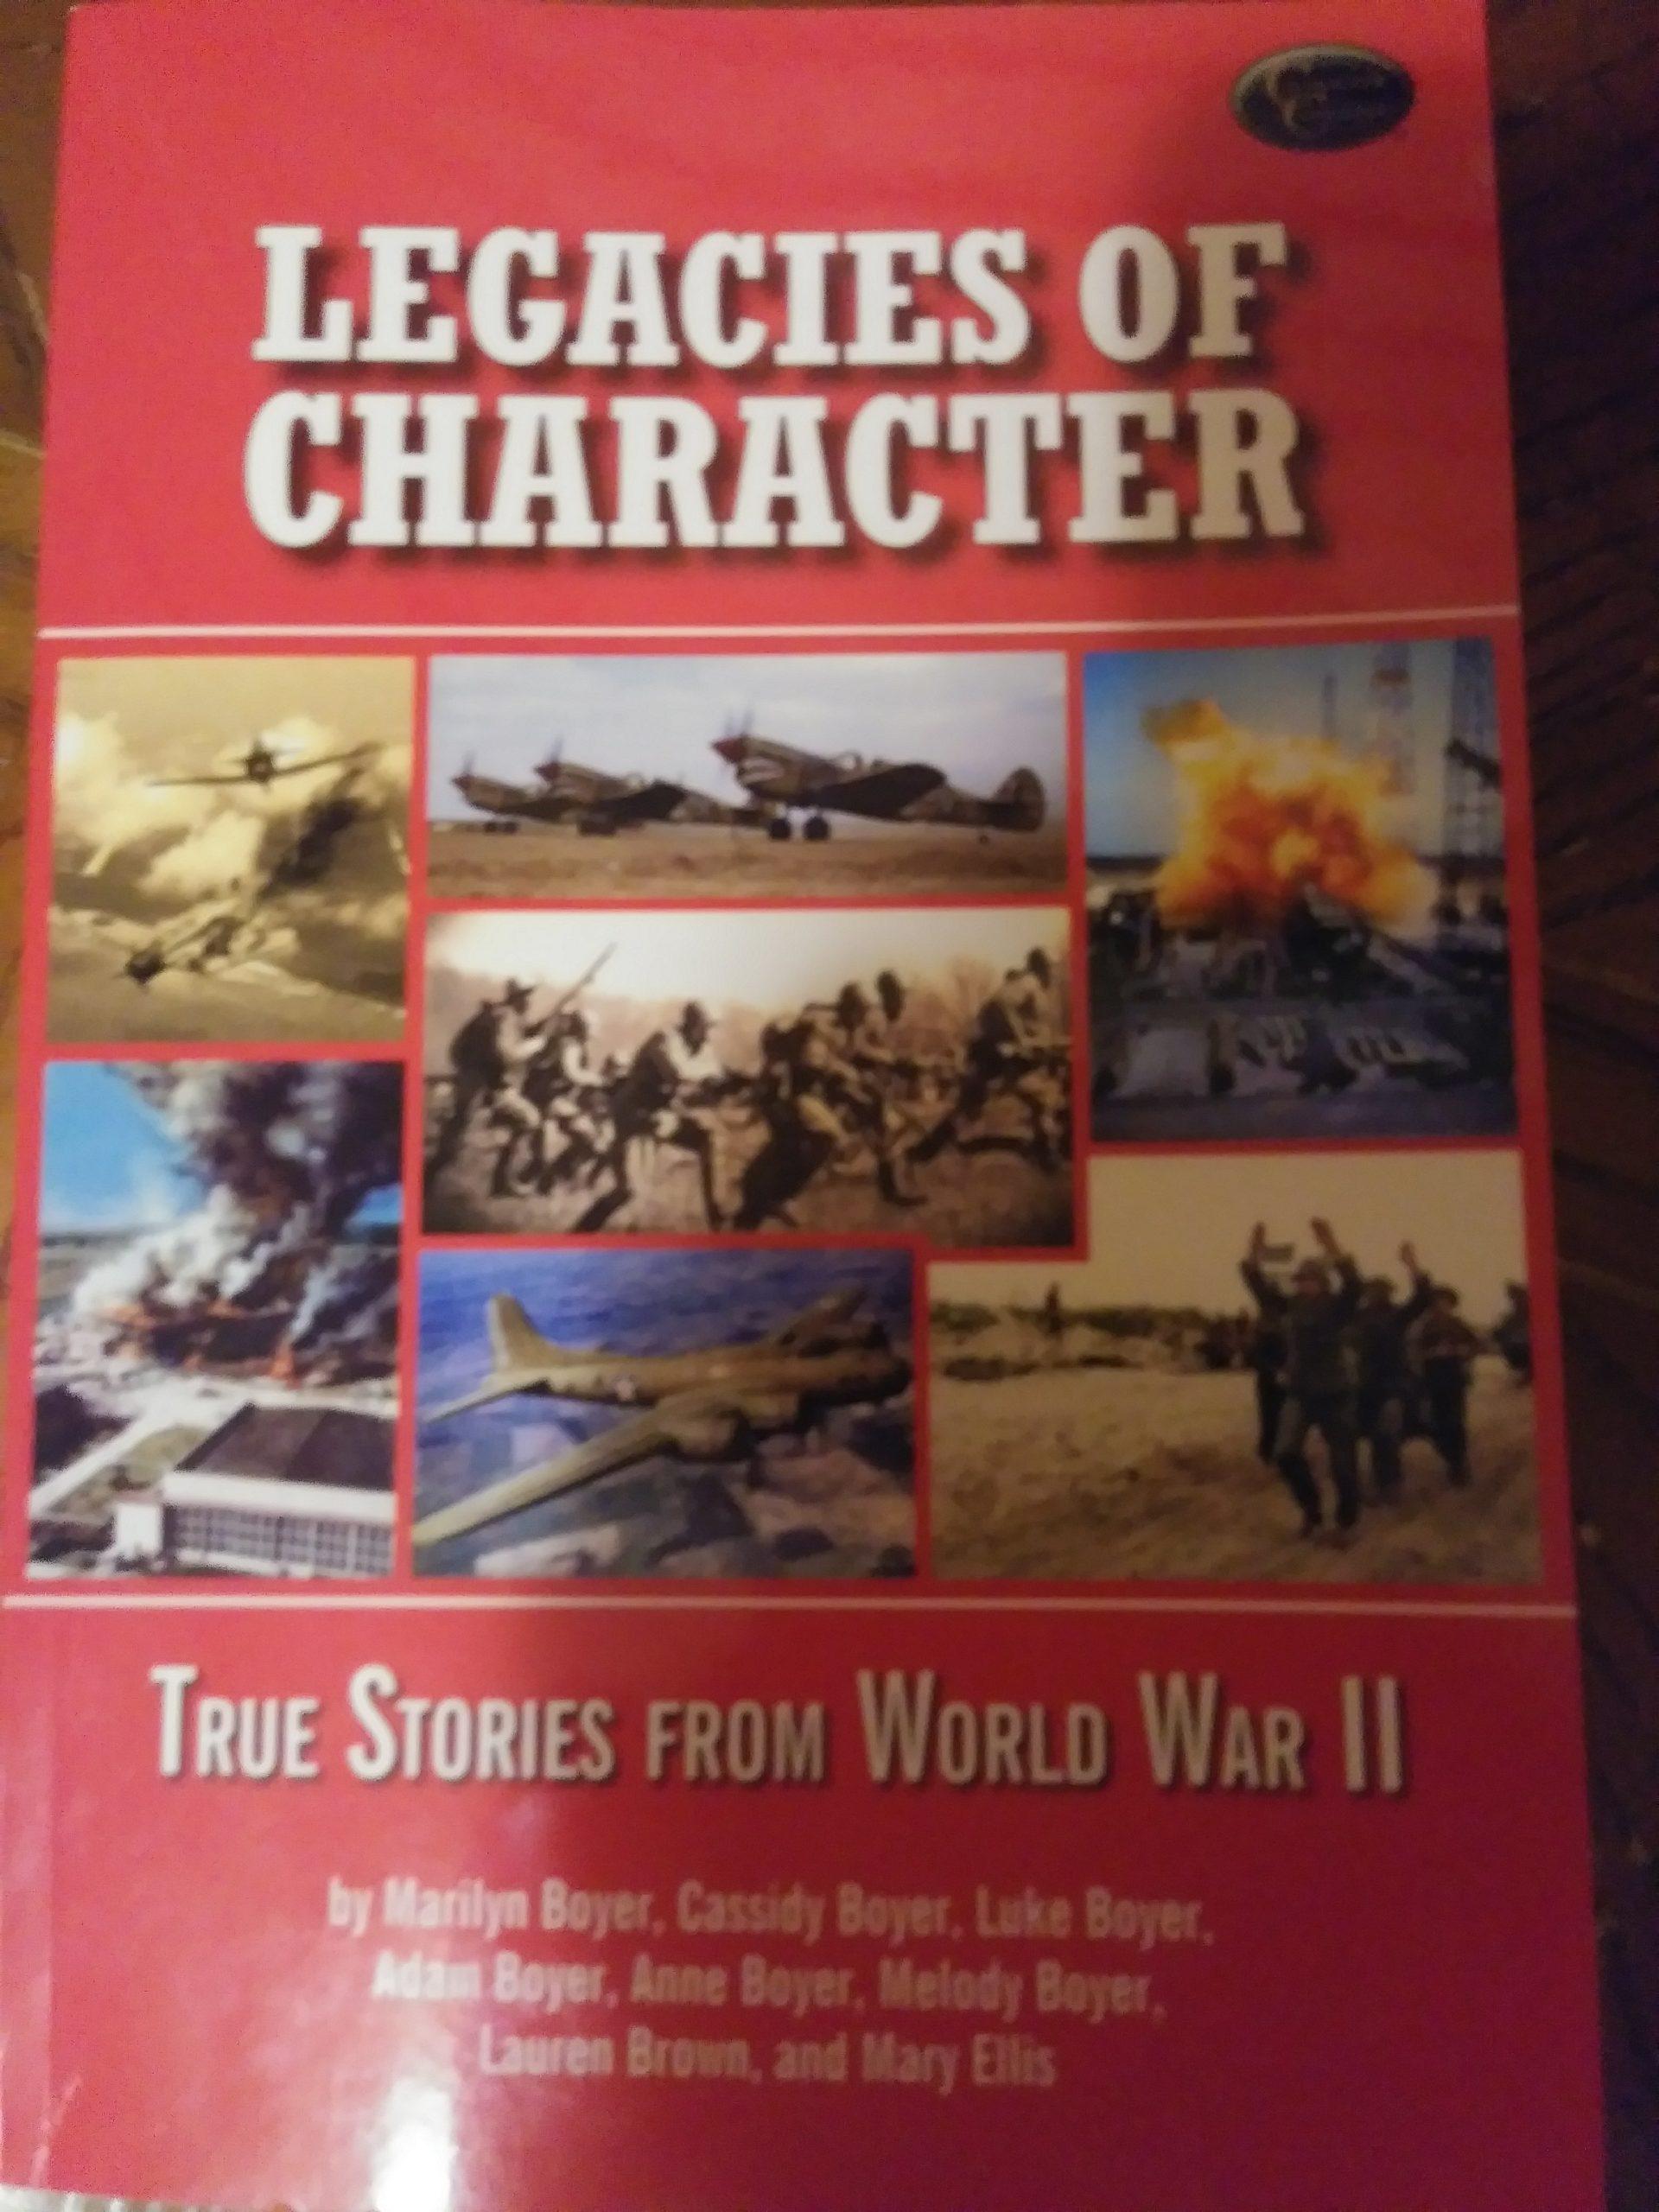 character training legacies of character